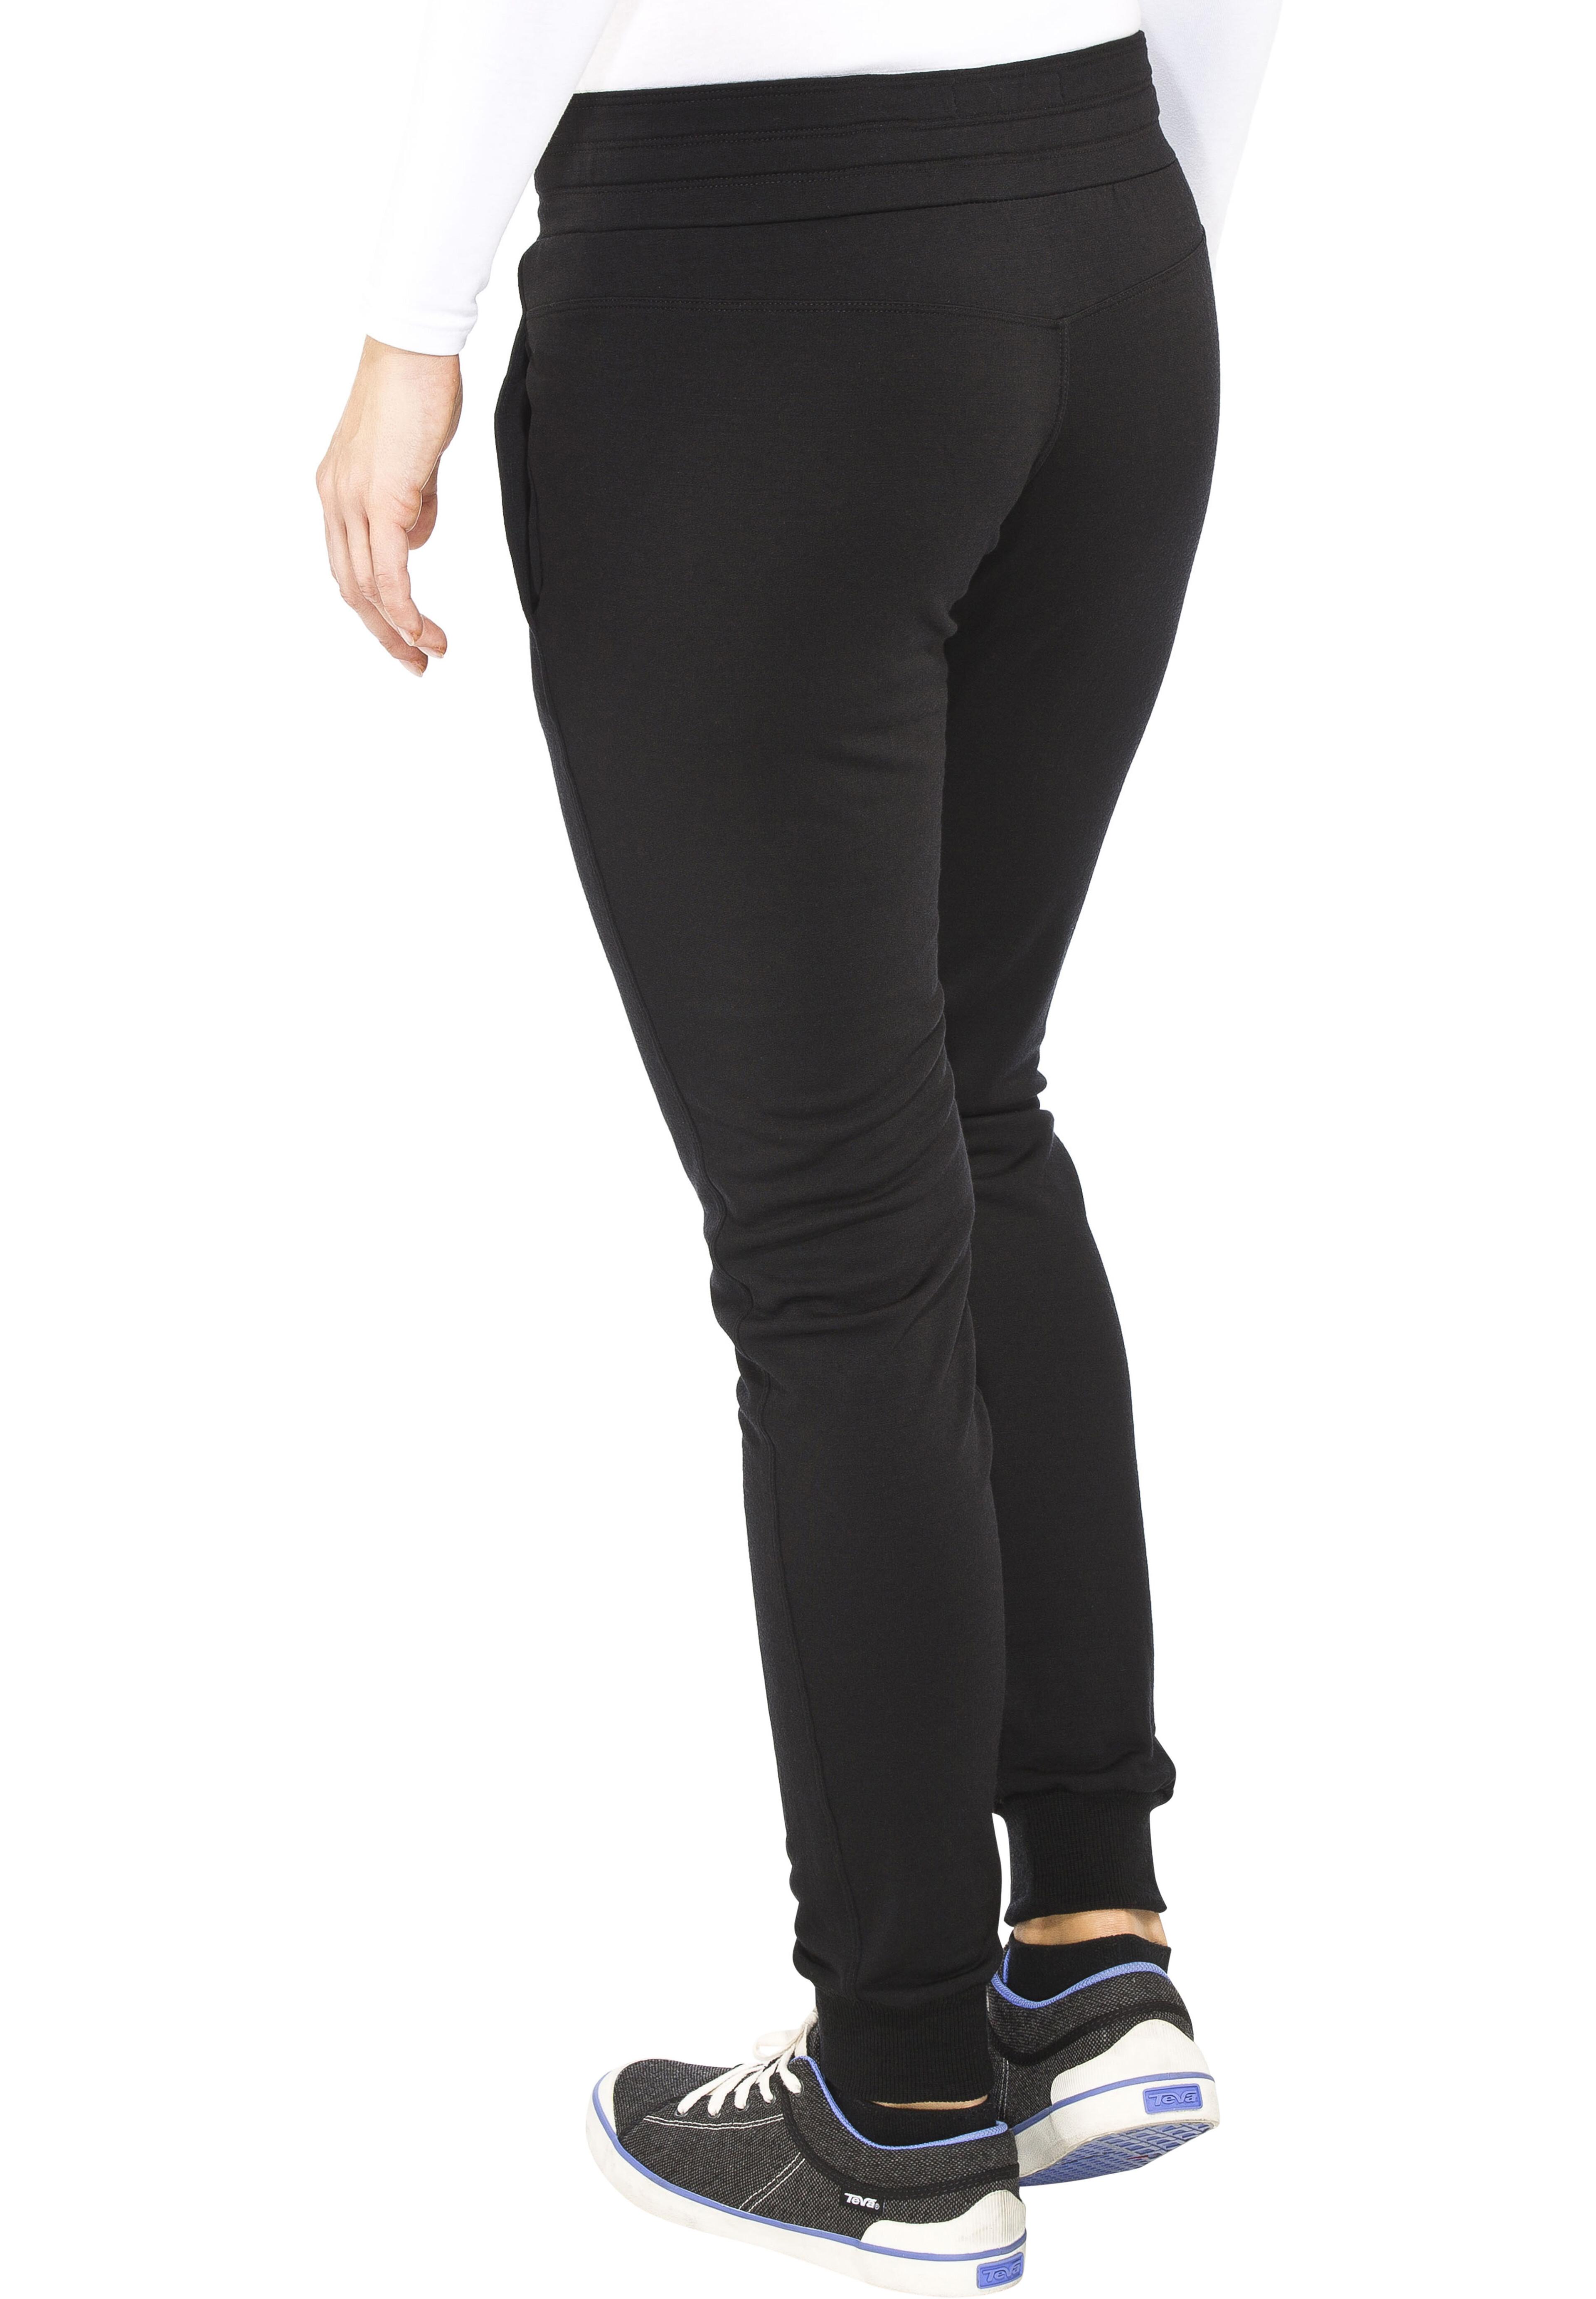 b574c09c7977d Icebreaker Crush Pants Women black at Addnature.co.uk